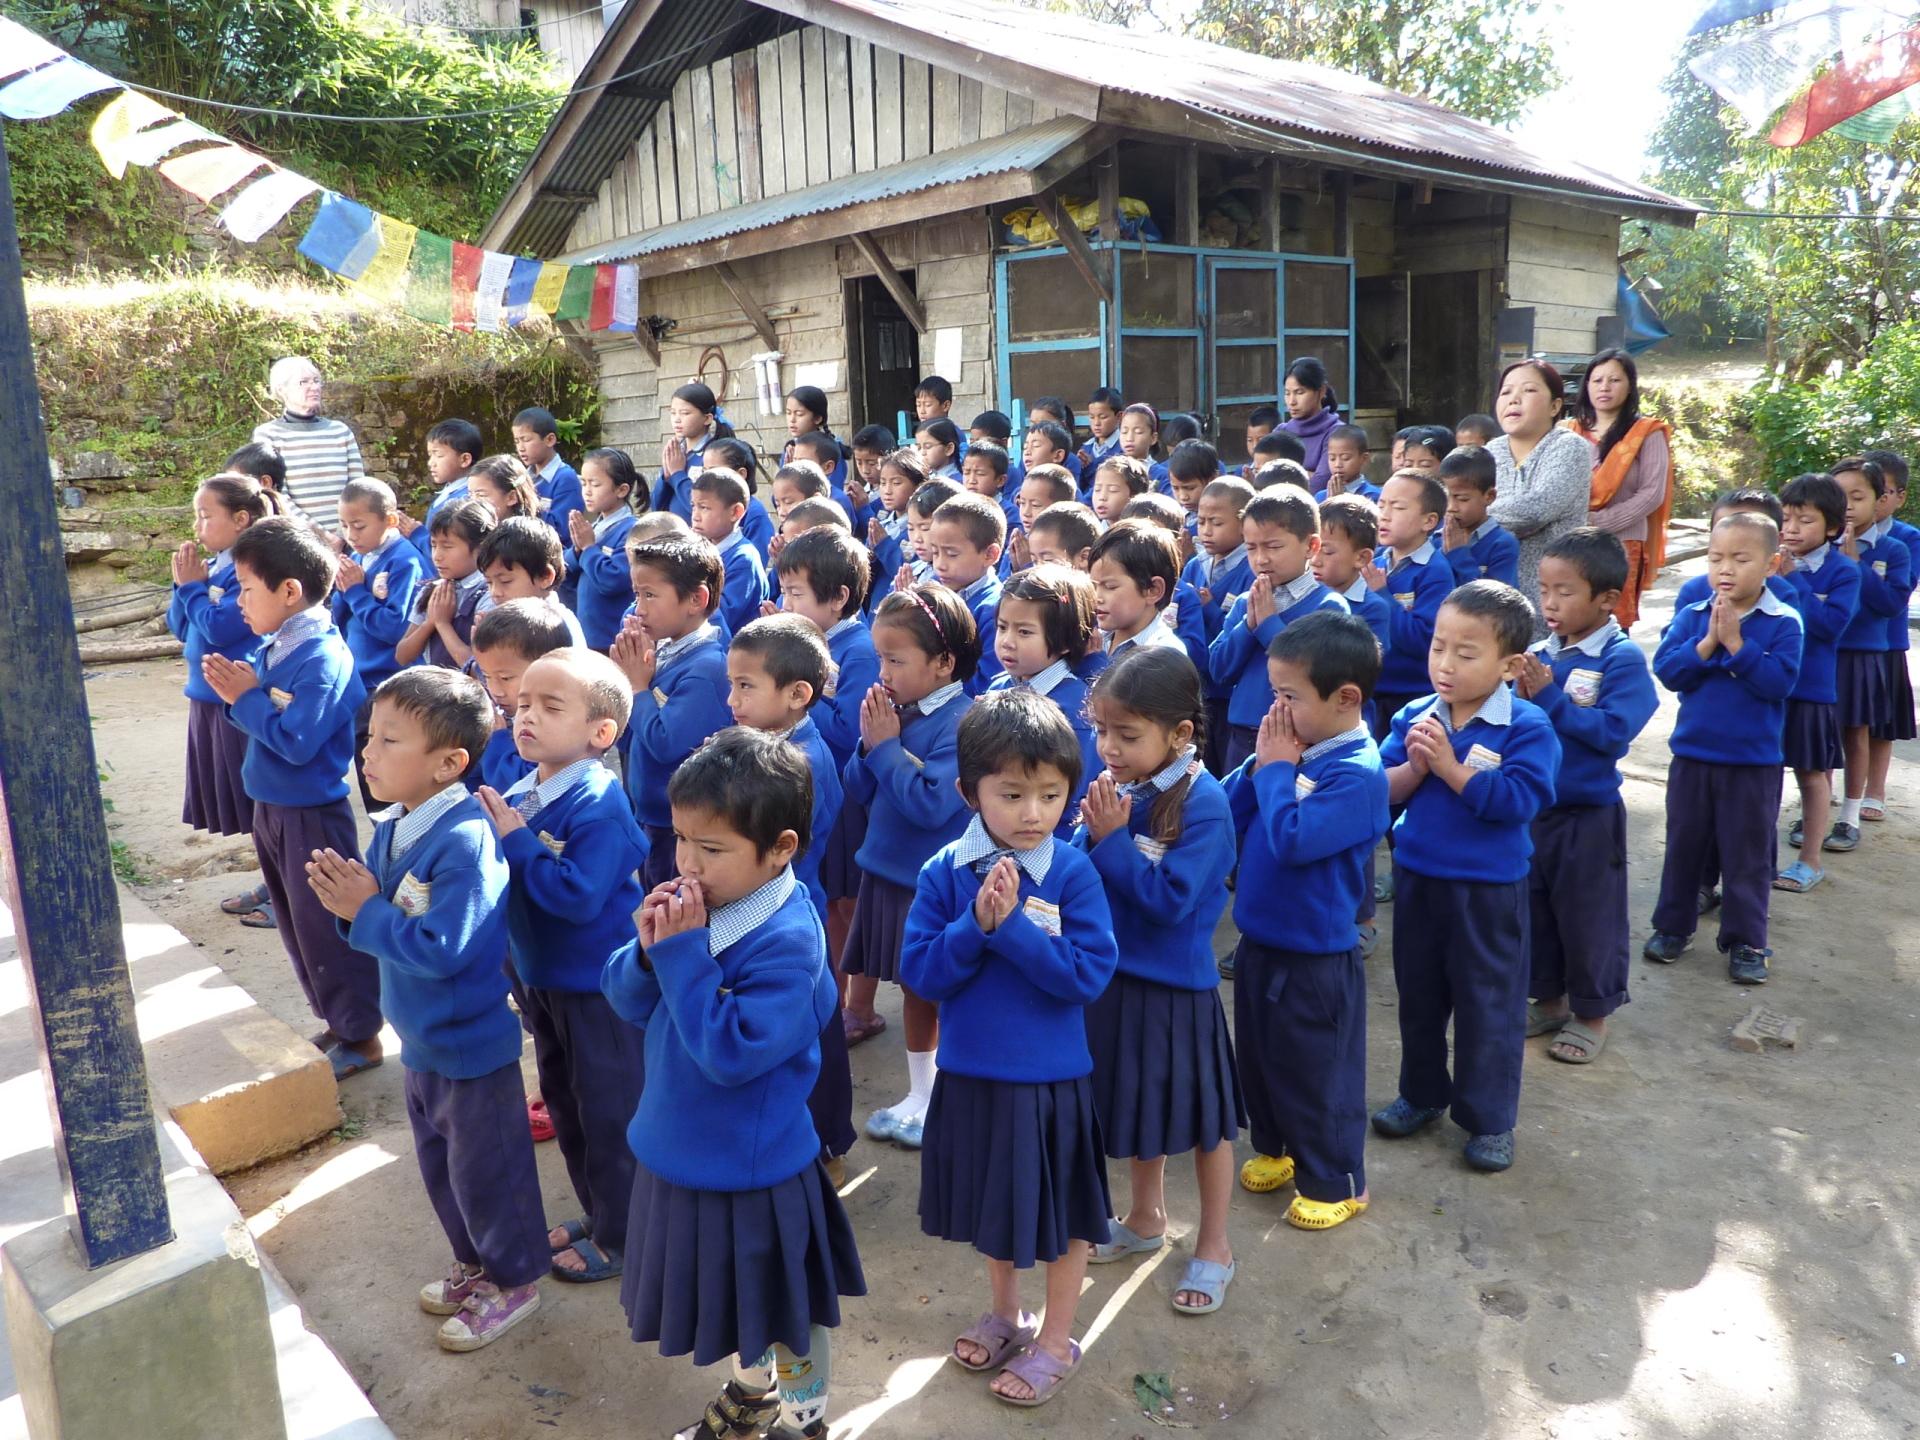 2010: Assembly at Sikkim Himalayan Academy